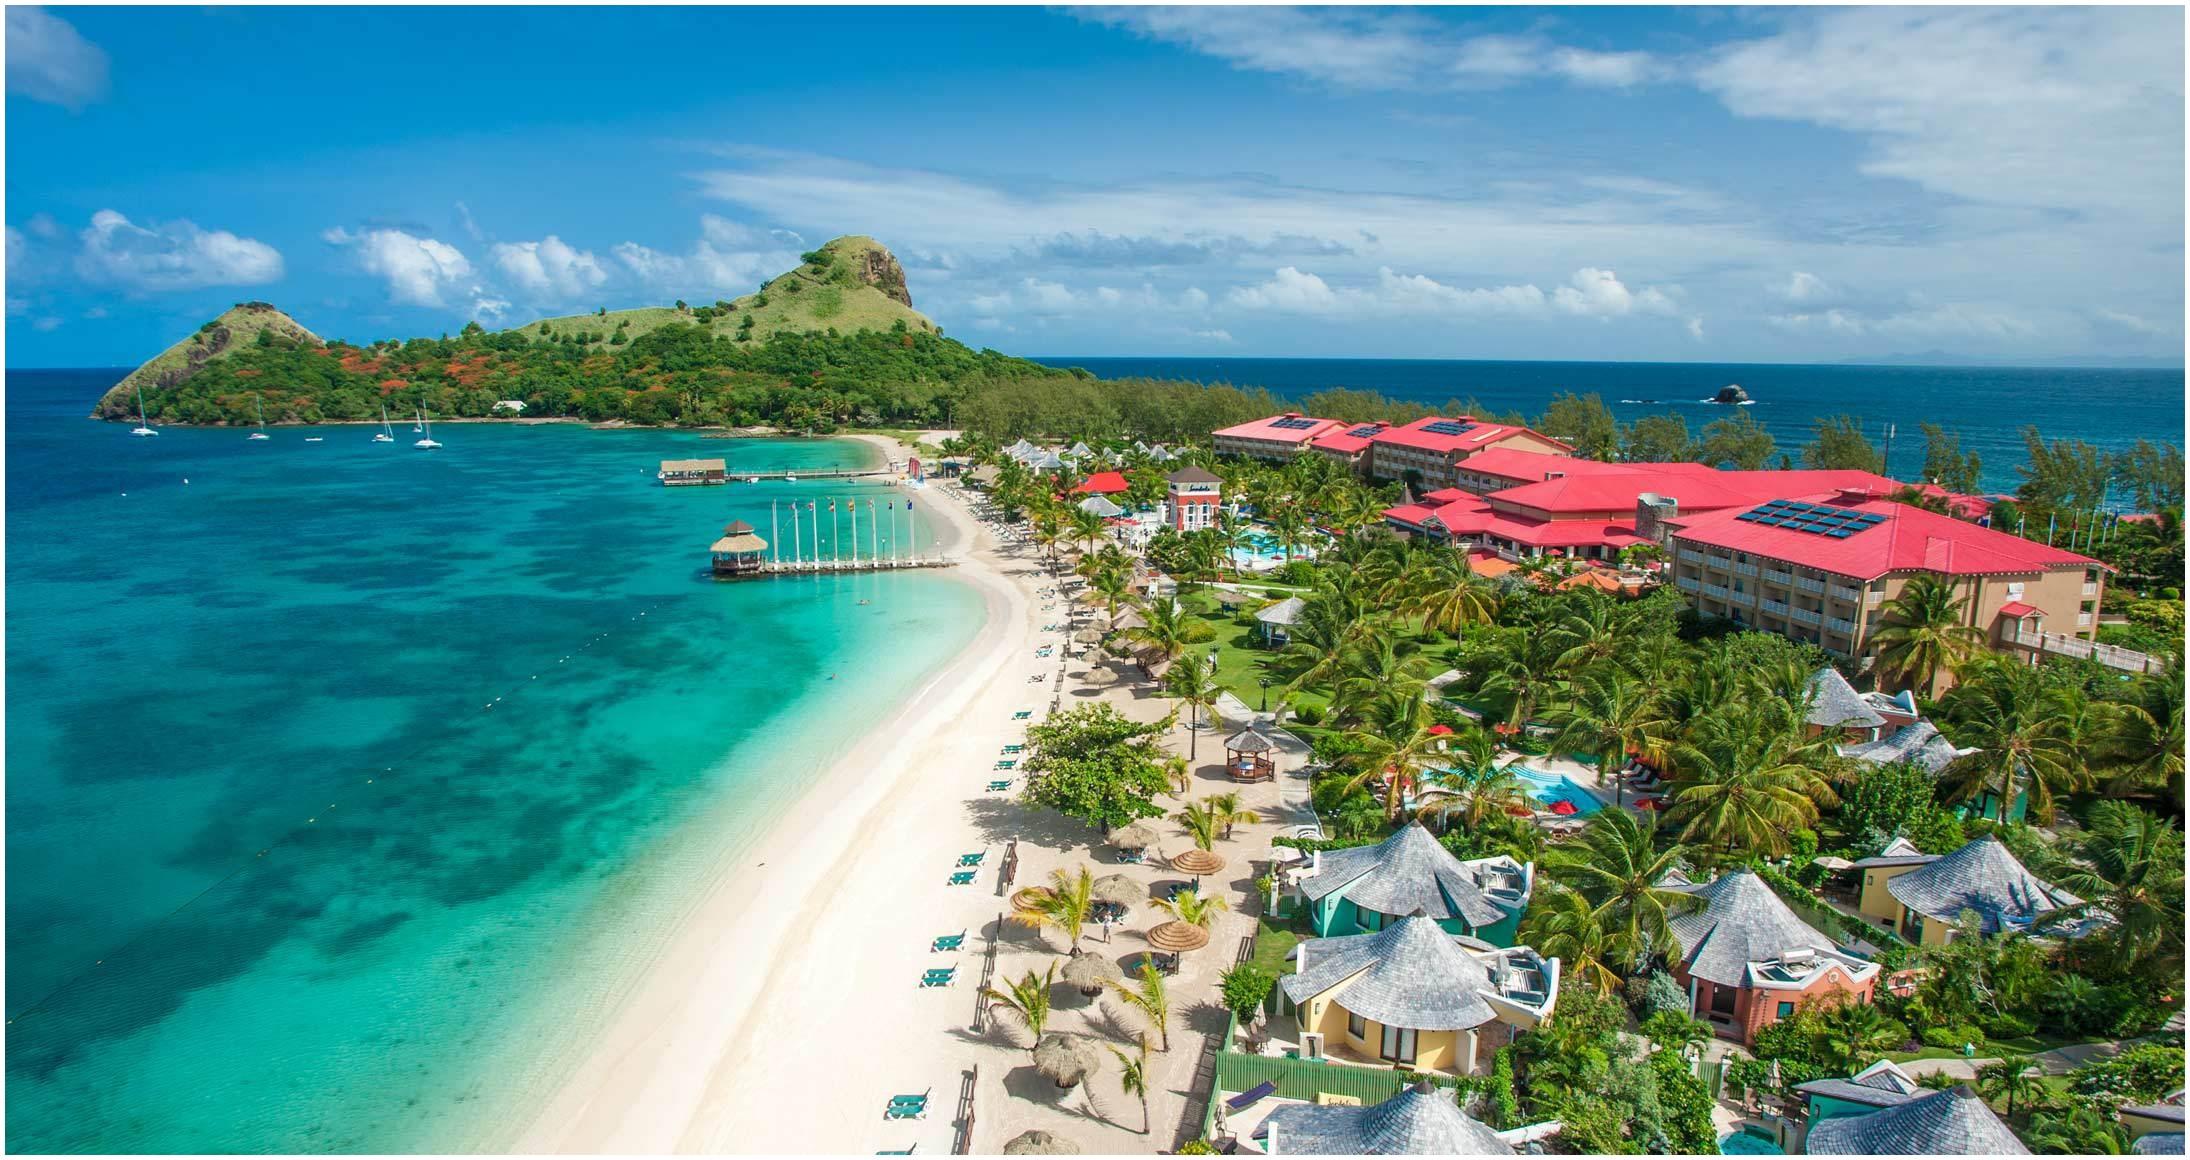 aerial beach ocean mountains resort